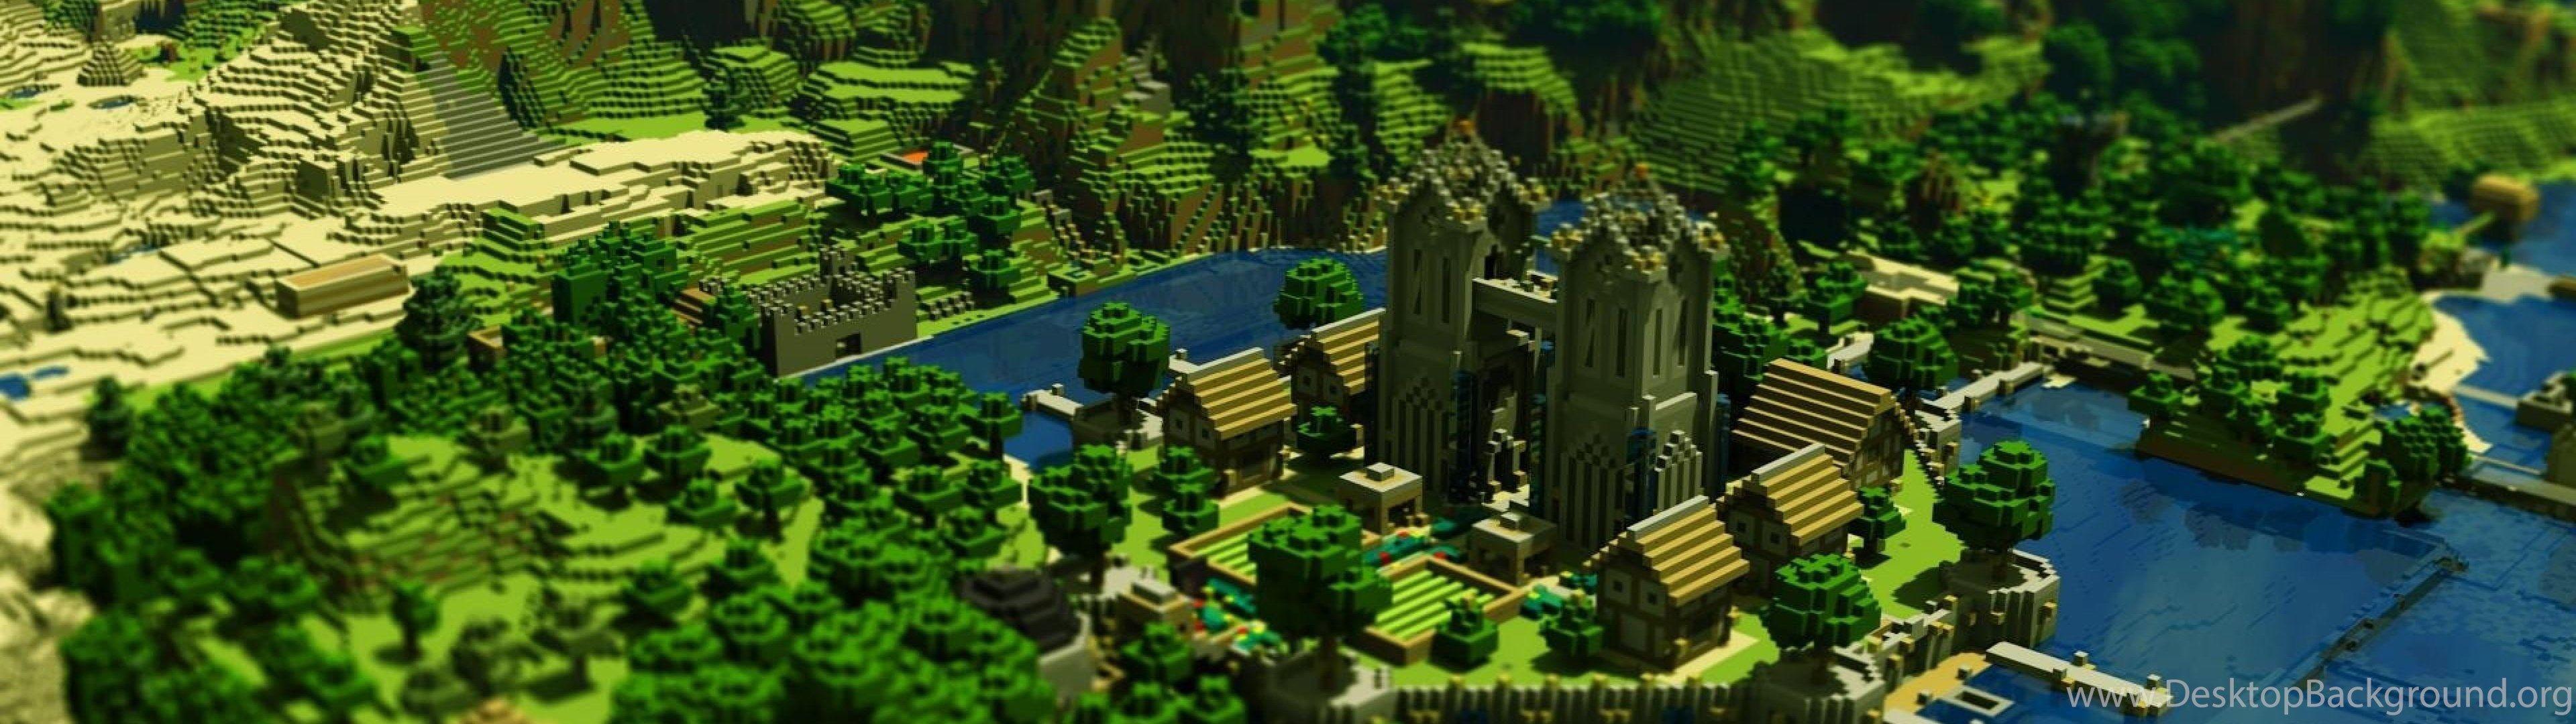 "1920x1200 Minecraft HD Wallpaper | Background Image | 1920x1200 | ID:413114 ..."">"